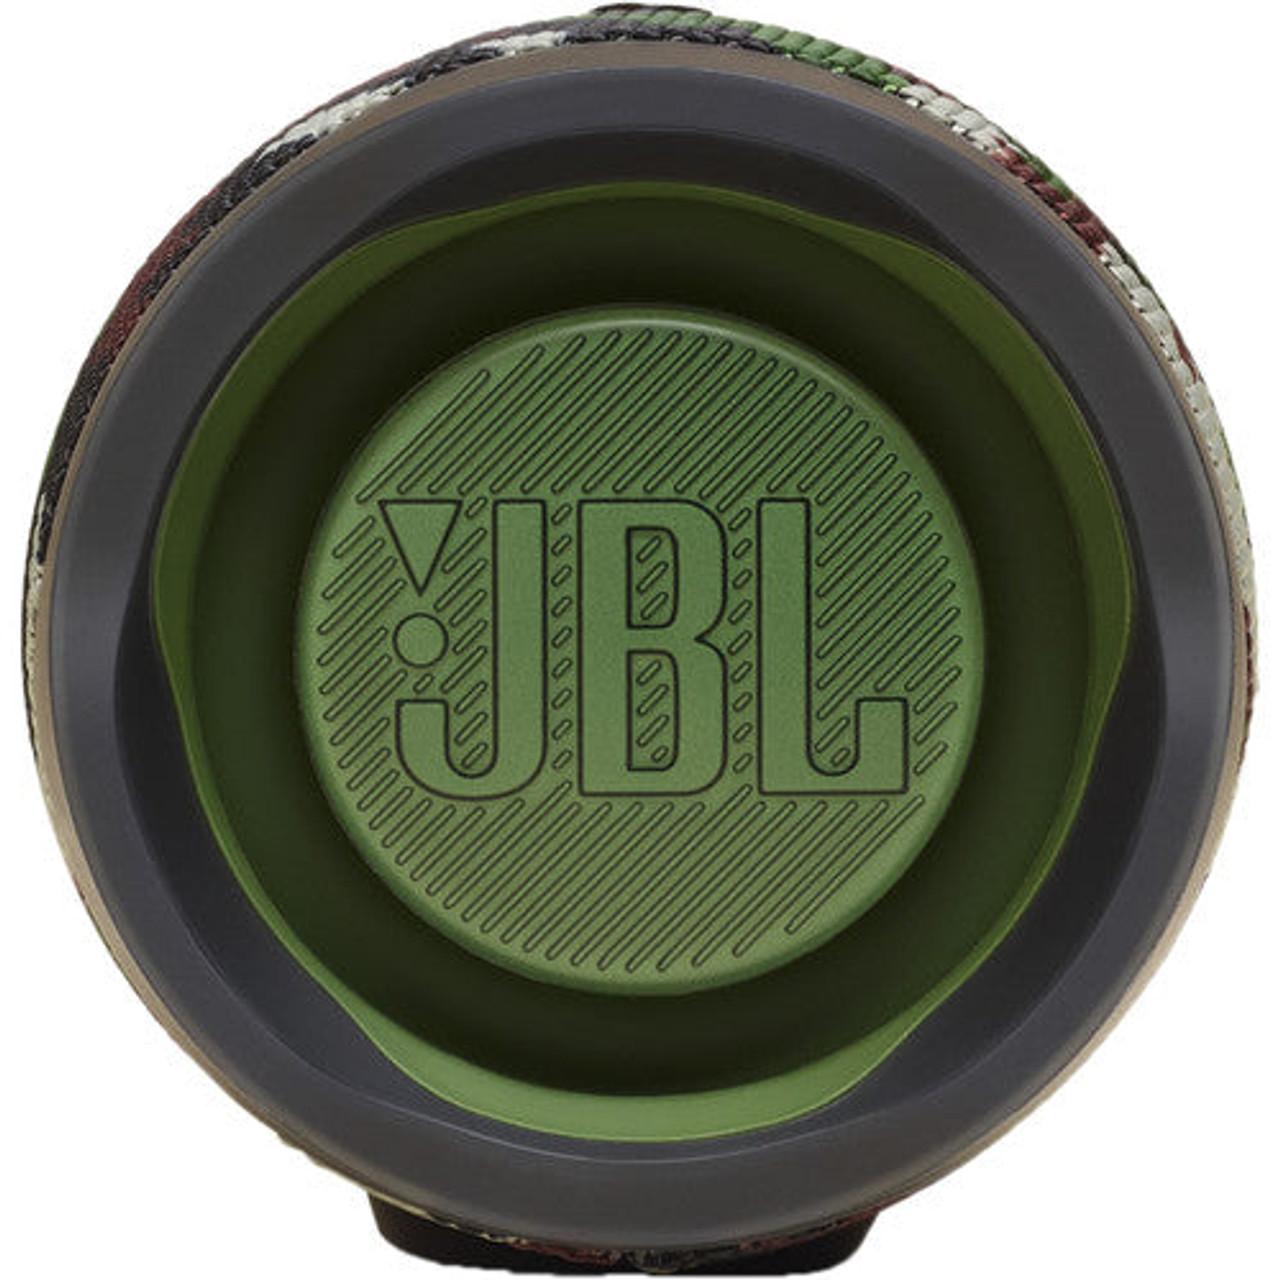 JBL JBLCHARGE4BCAMAM-Z Charge 4 Bluetooth Speaker Camo - Certified Refurbished